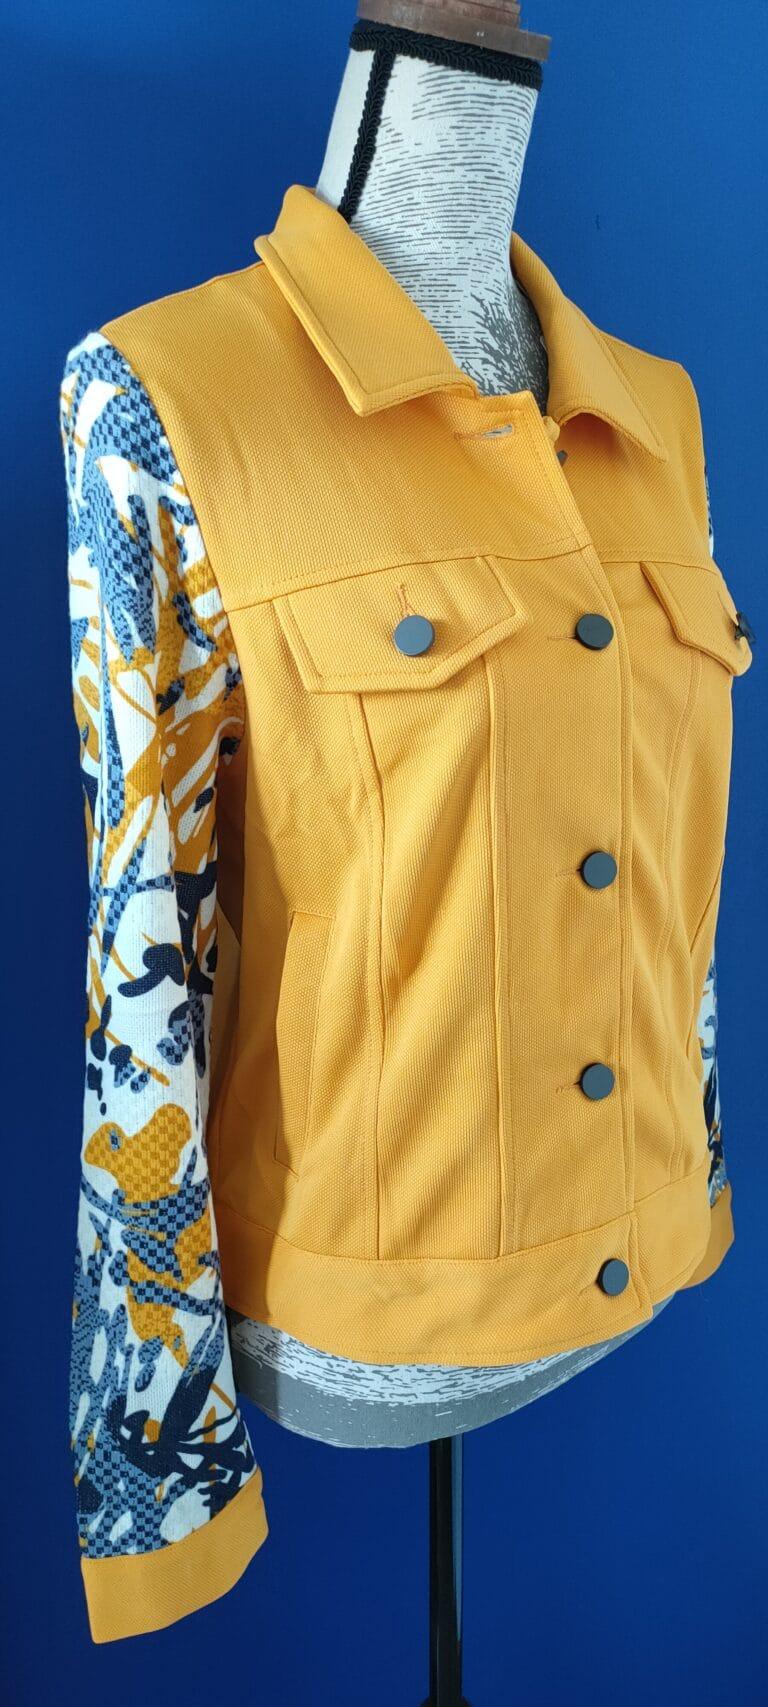 veste jaune motif profil